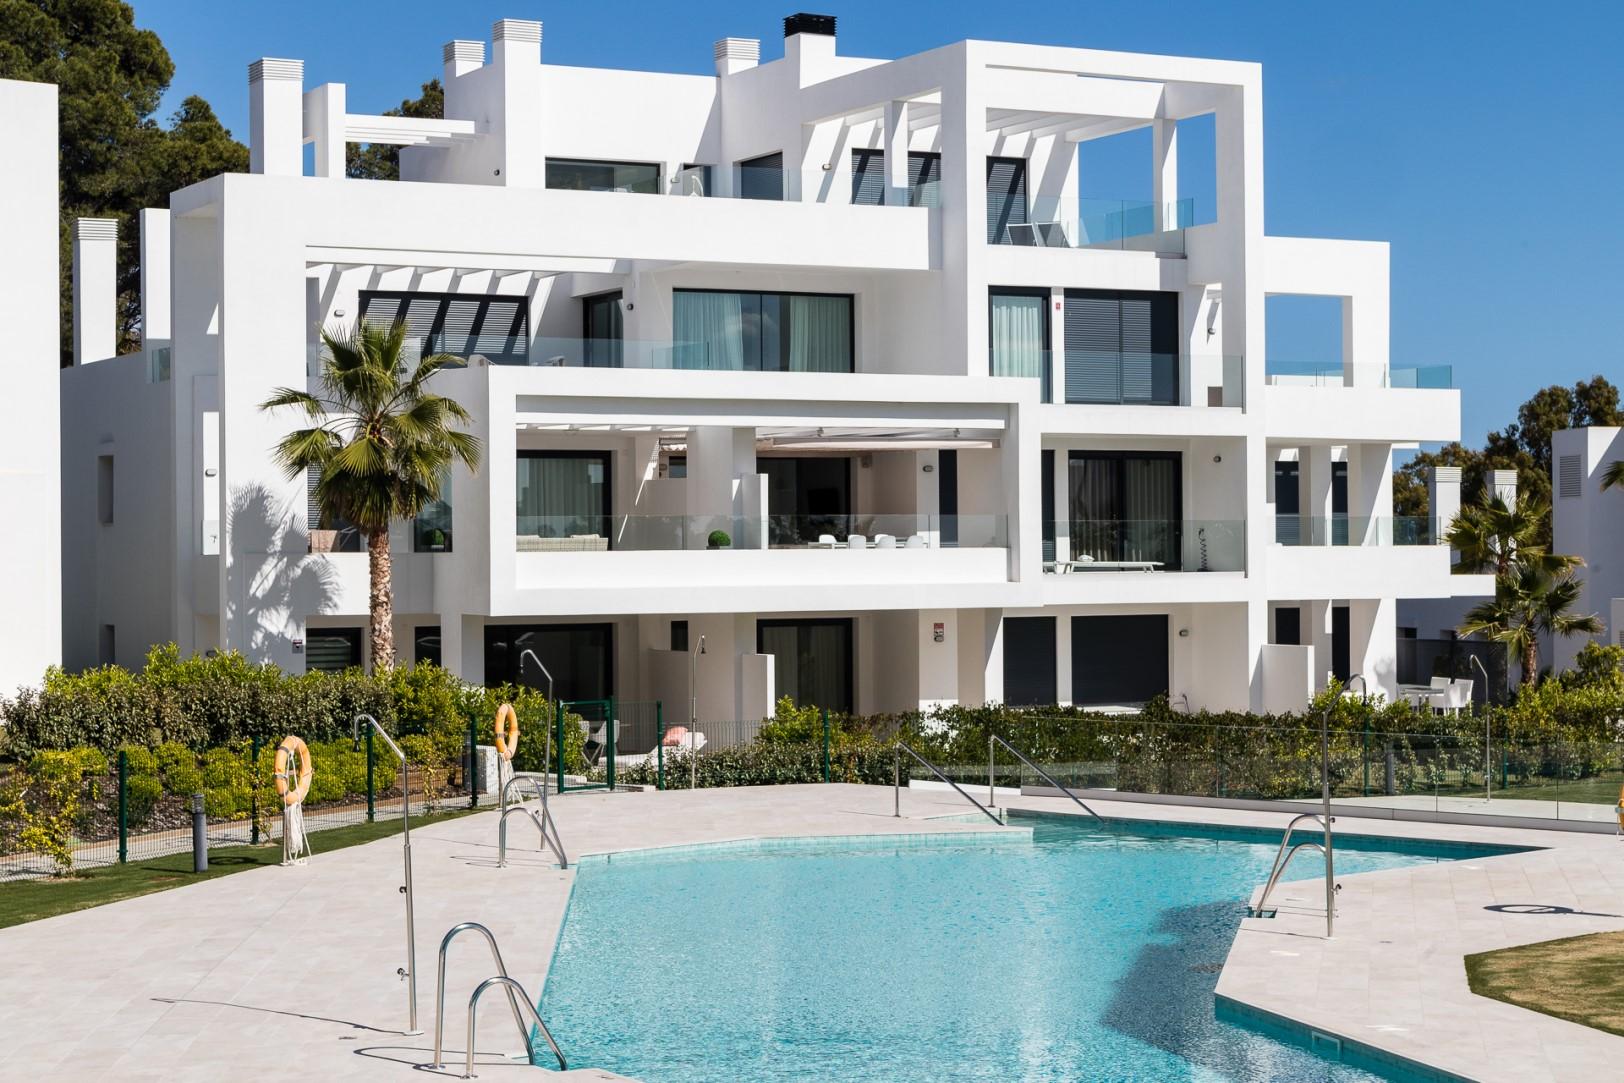 Las Terrazas, luxe nieuwbouwappartemente